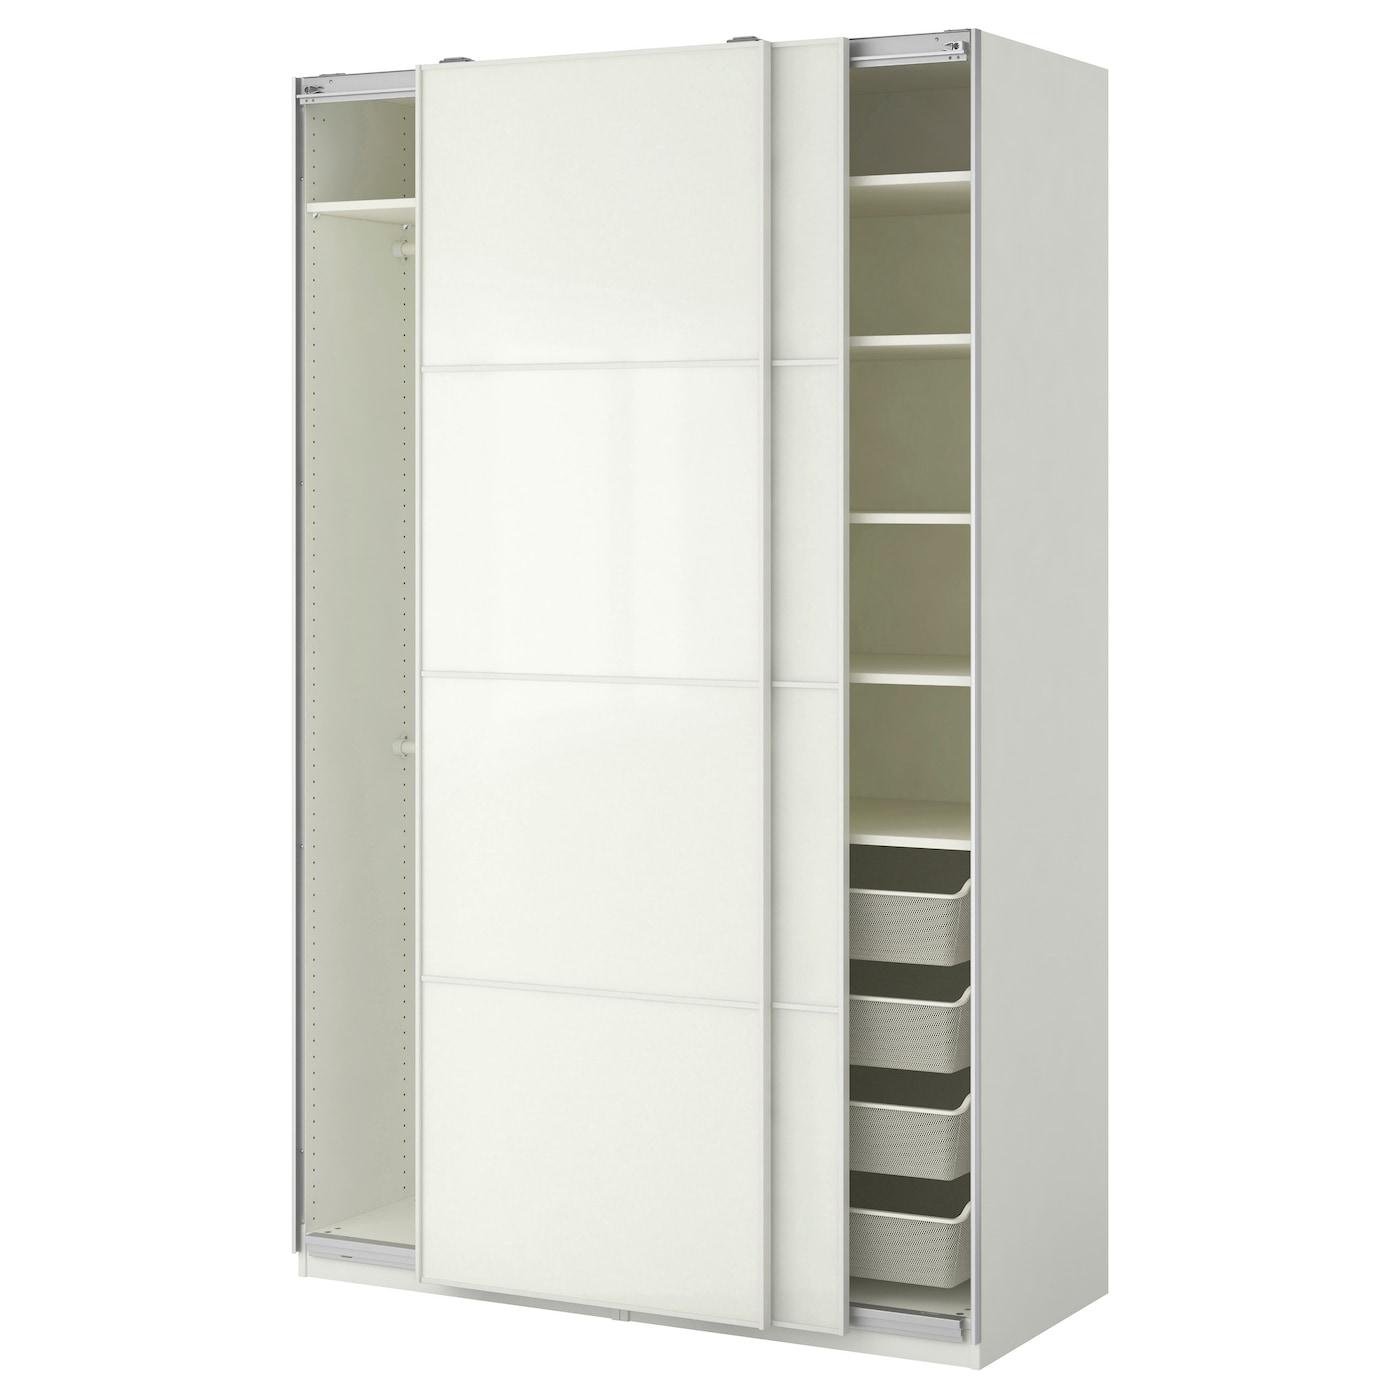 PAX syst u00e8me Combinaisons avec portes IKEA